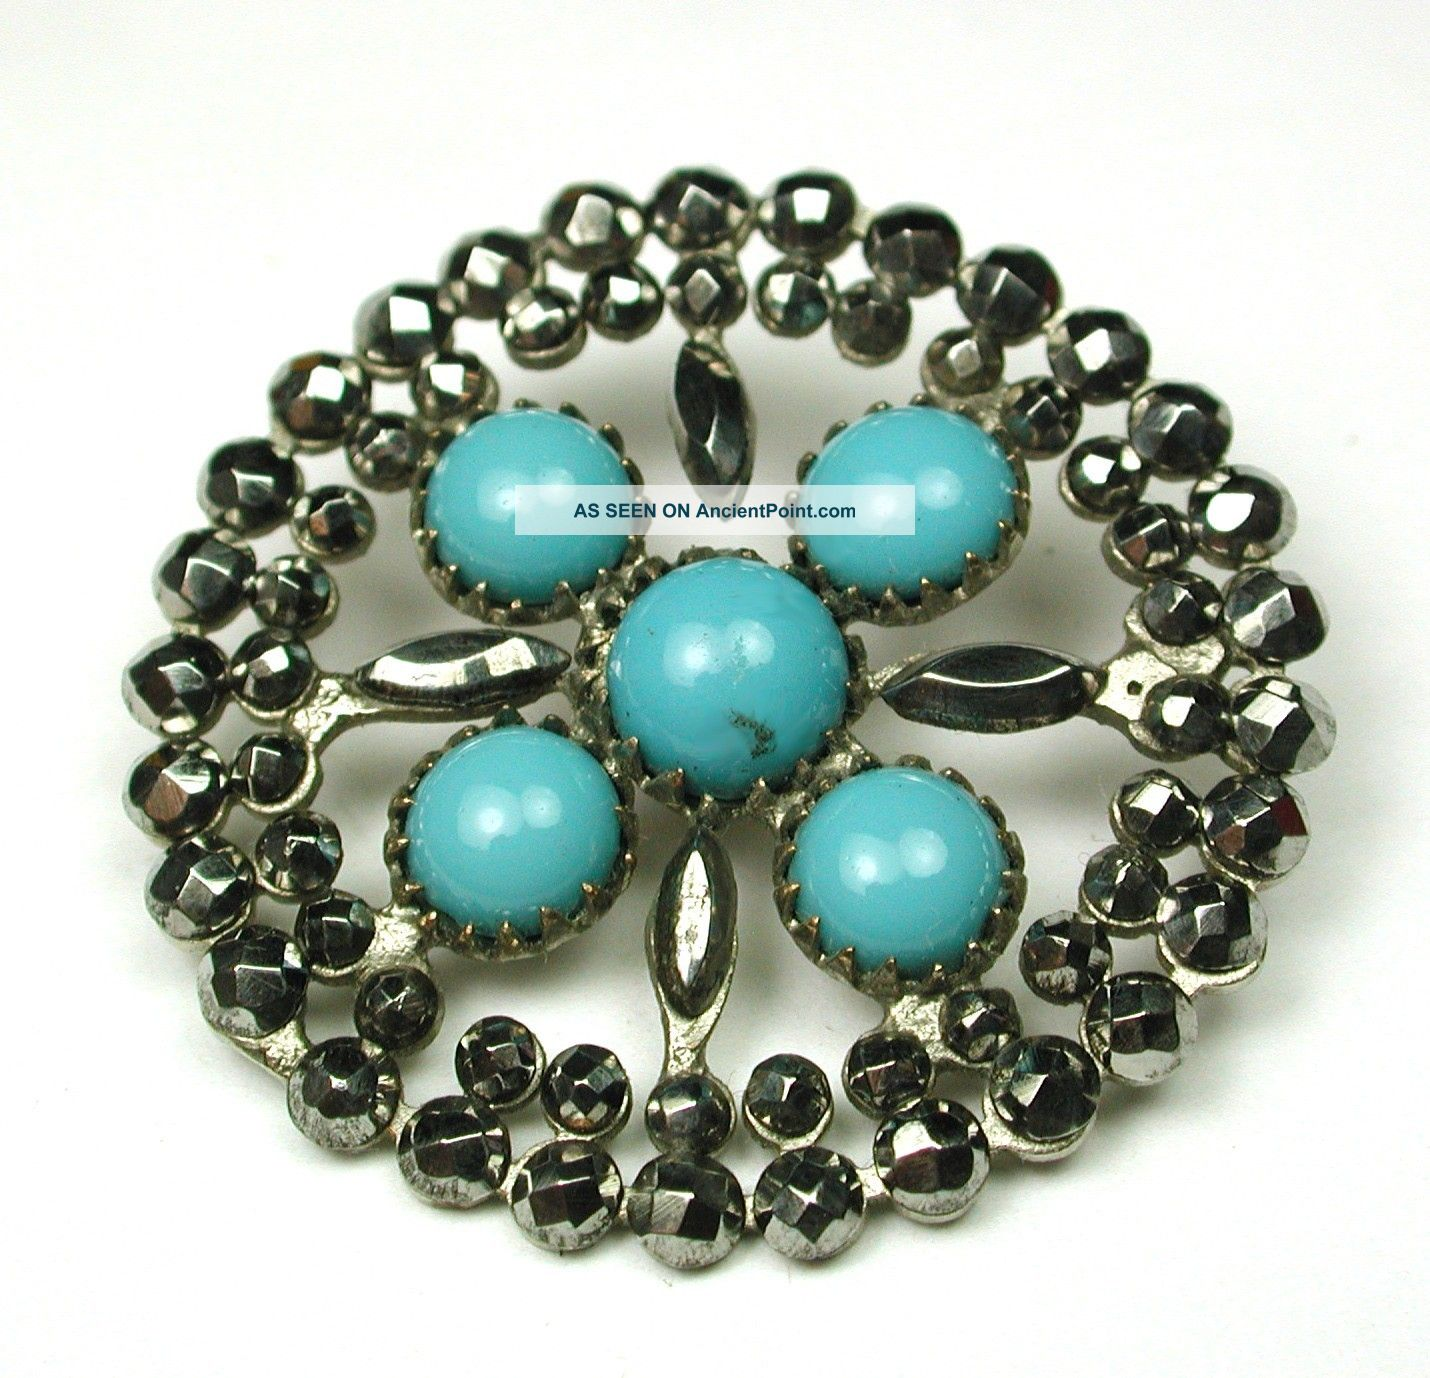 Antique Pierced Metal Button Turquoise W/ Cut Steel Accents & Border Buttons photo